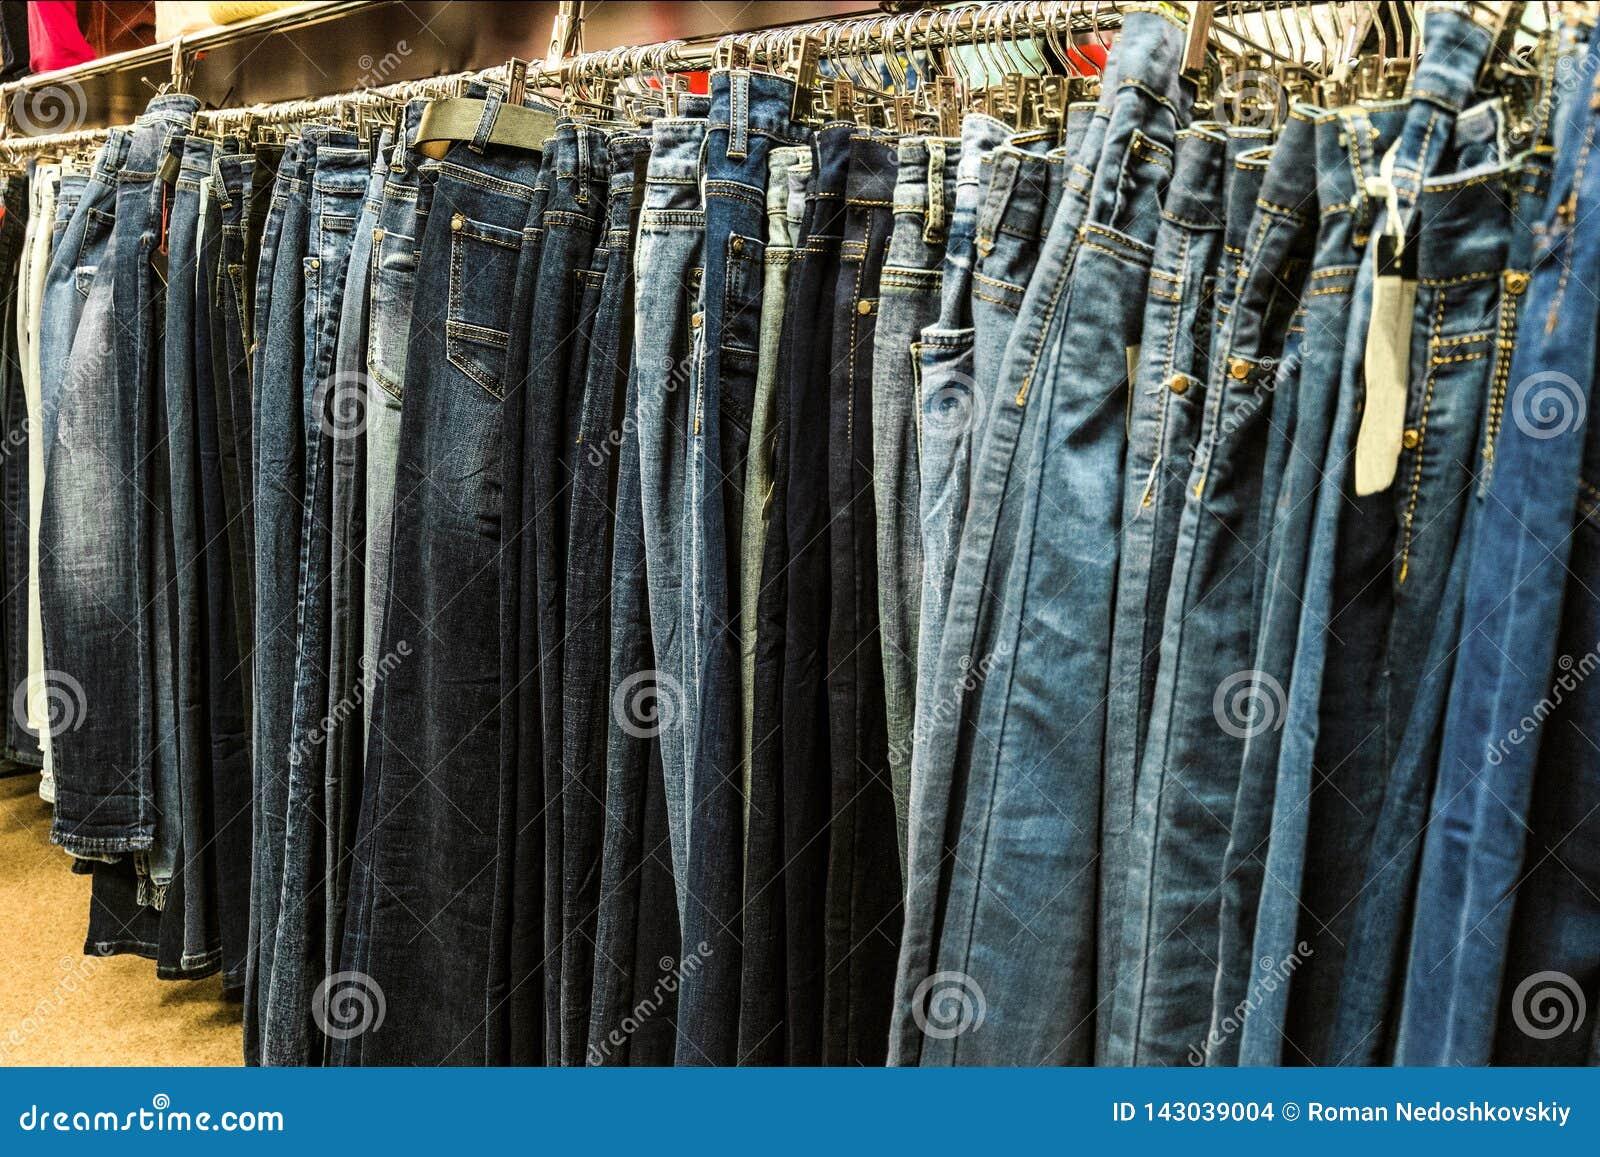 Row of denim pants hanging on trempels